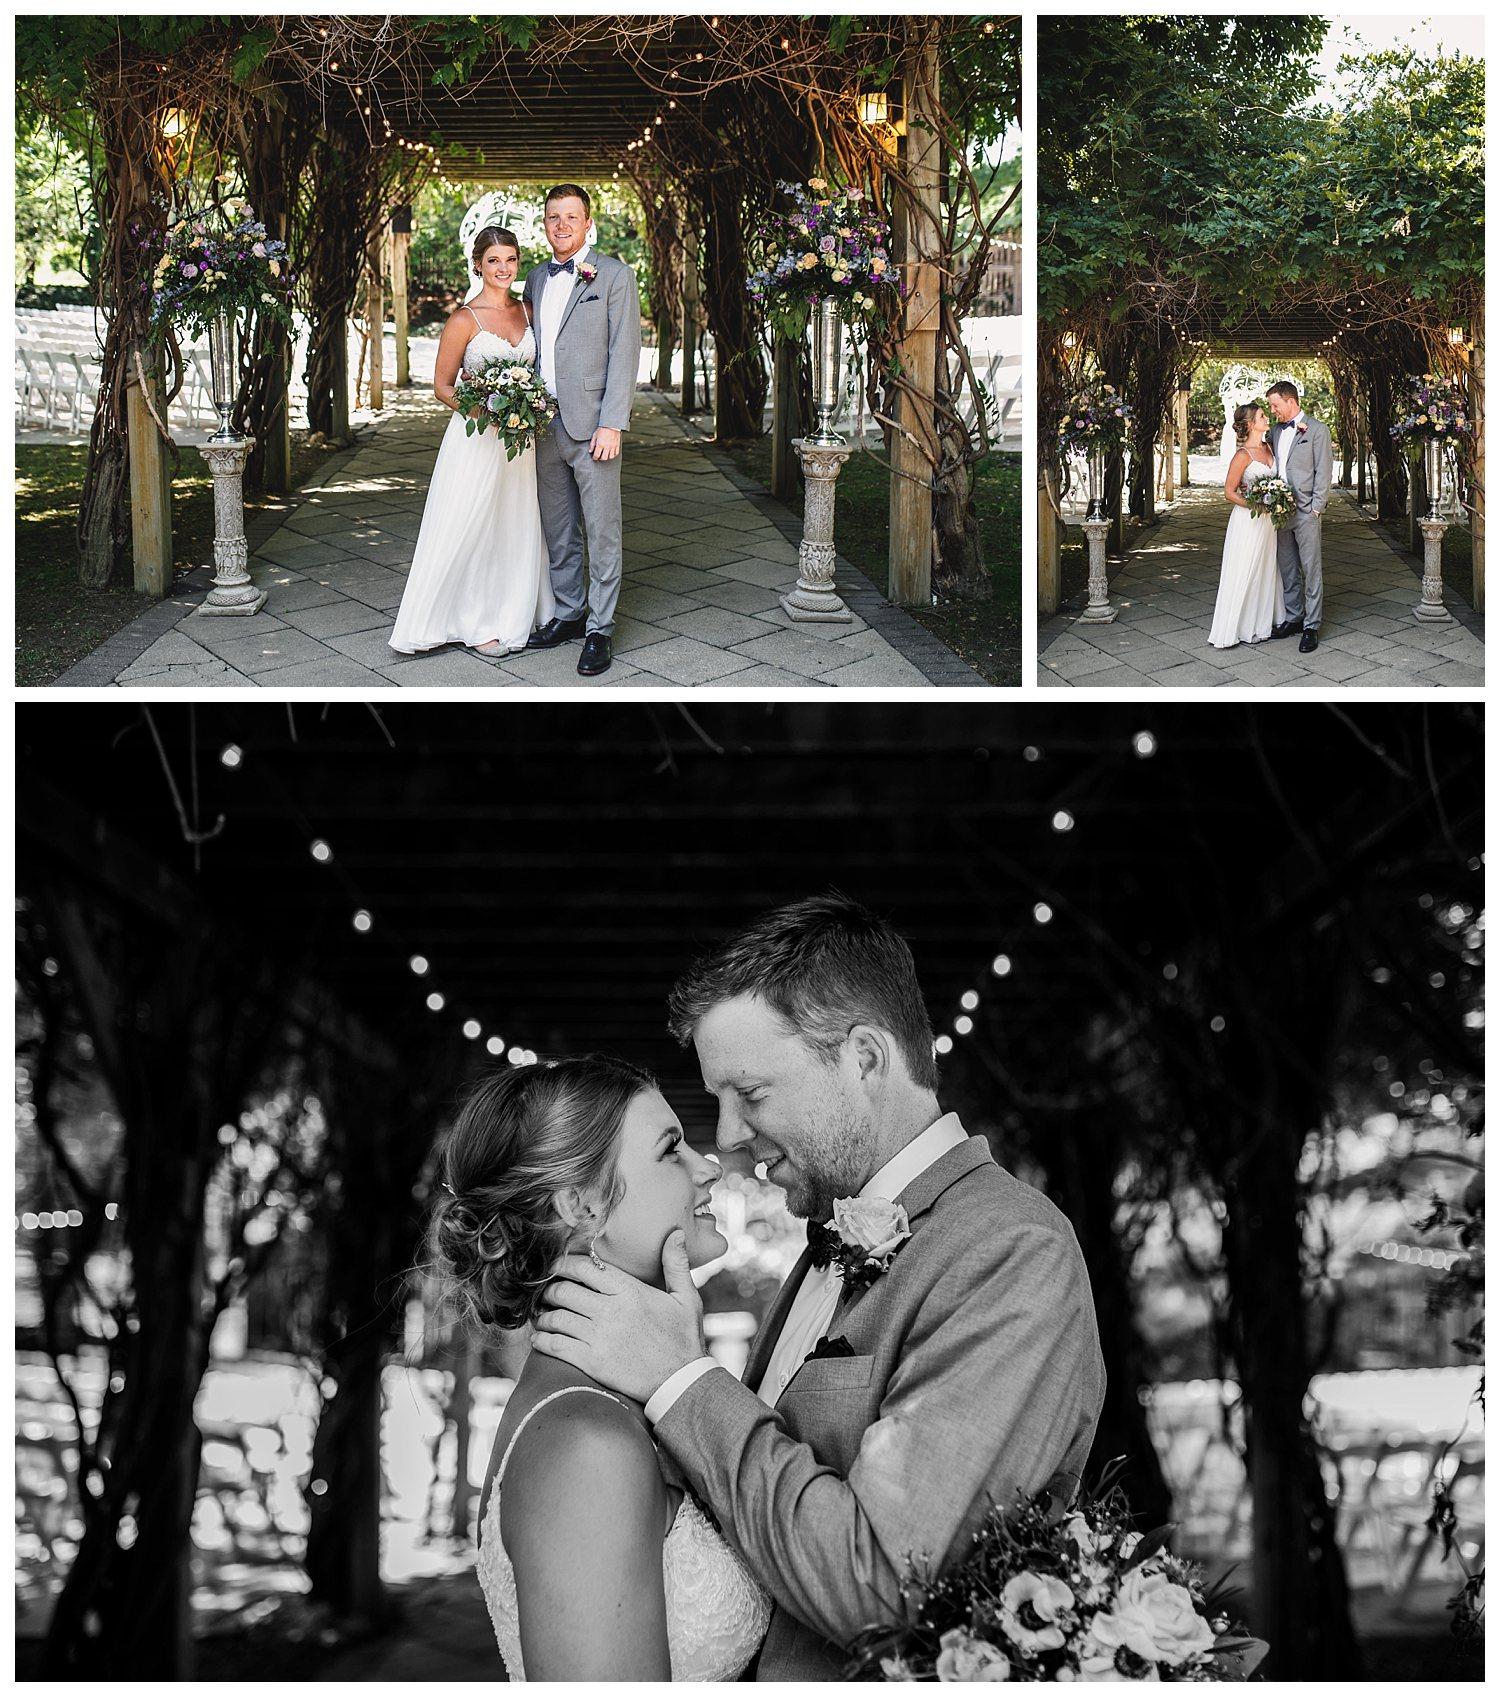 Kelsey_Diane_Photography_Kansas_City_Engagement_Wedding_Photographer_Midwest_Traveling_Missouri_Lee_Andrew_Hall_And_Garden_Blue_Springs_Wedding_Clayton_Kimberly_Summer_Wedding_0830.jpg